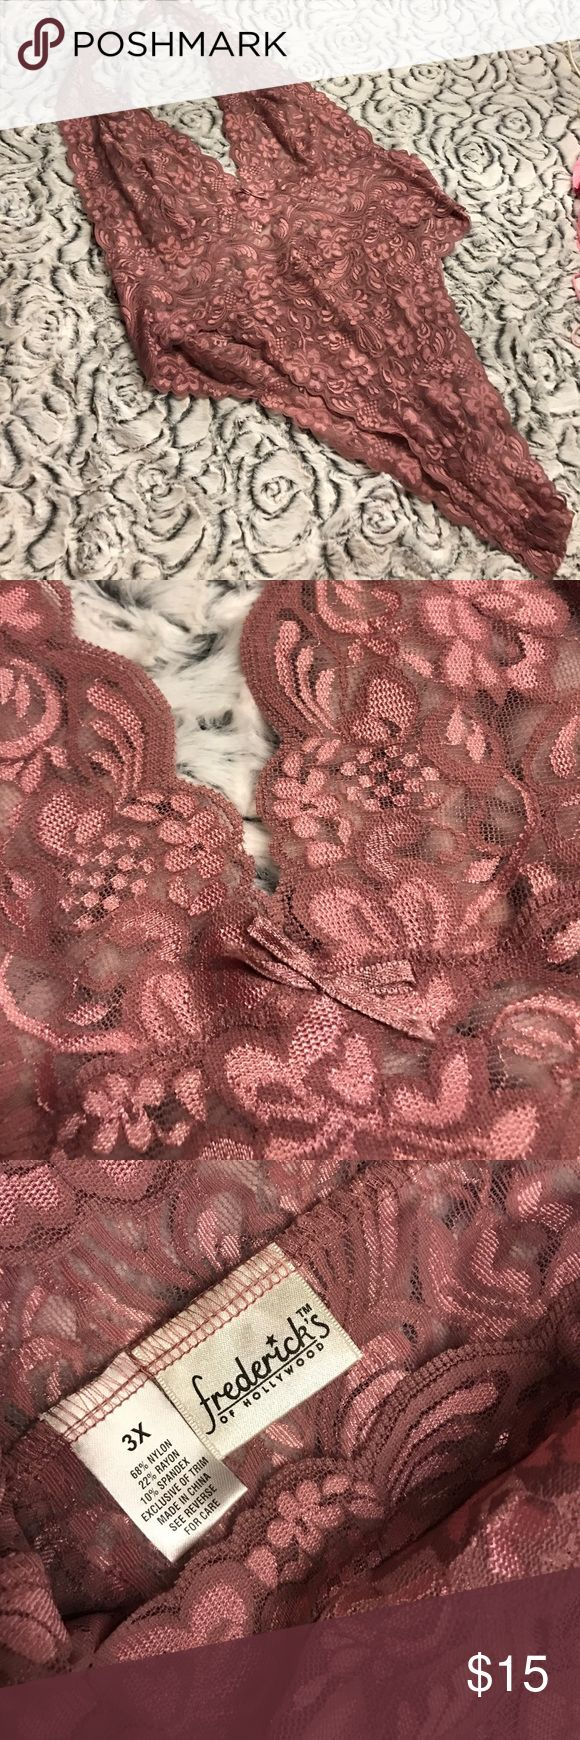 Sz 3x halter bodysuit by Fredericks of Hollywood This is a tempting lace halter bodysuit by Fredericks of Hollywood in mauve hues. Frederick's of Hollywood Intimates & Sleepwear Chemises & Slips